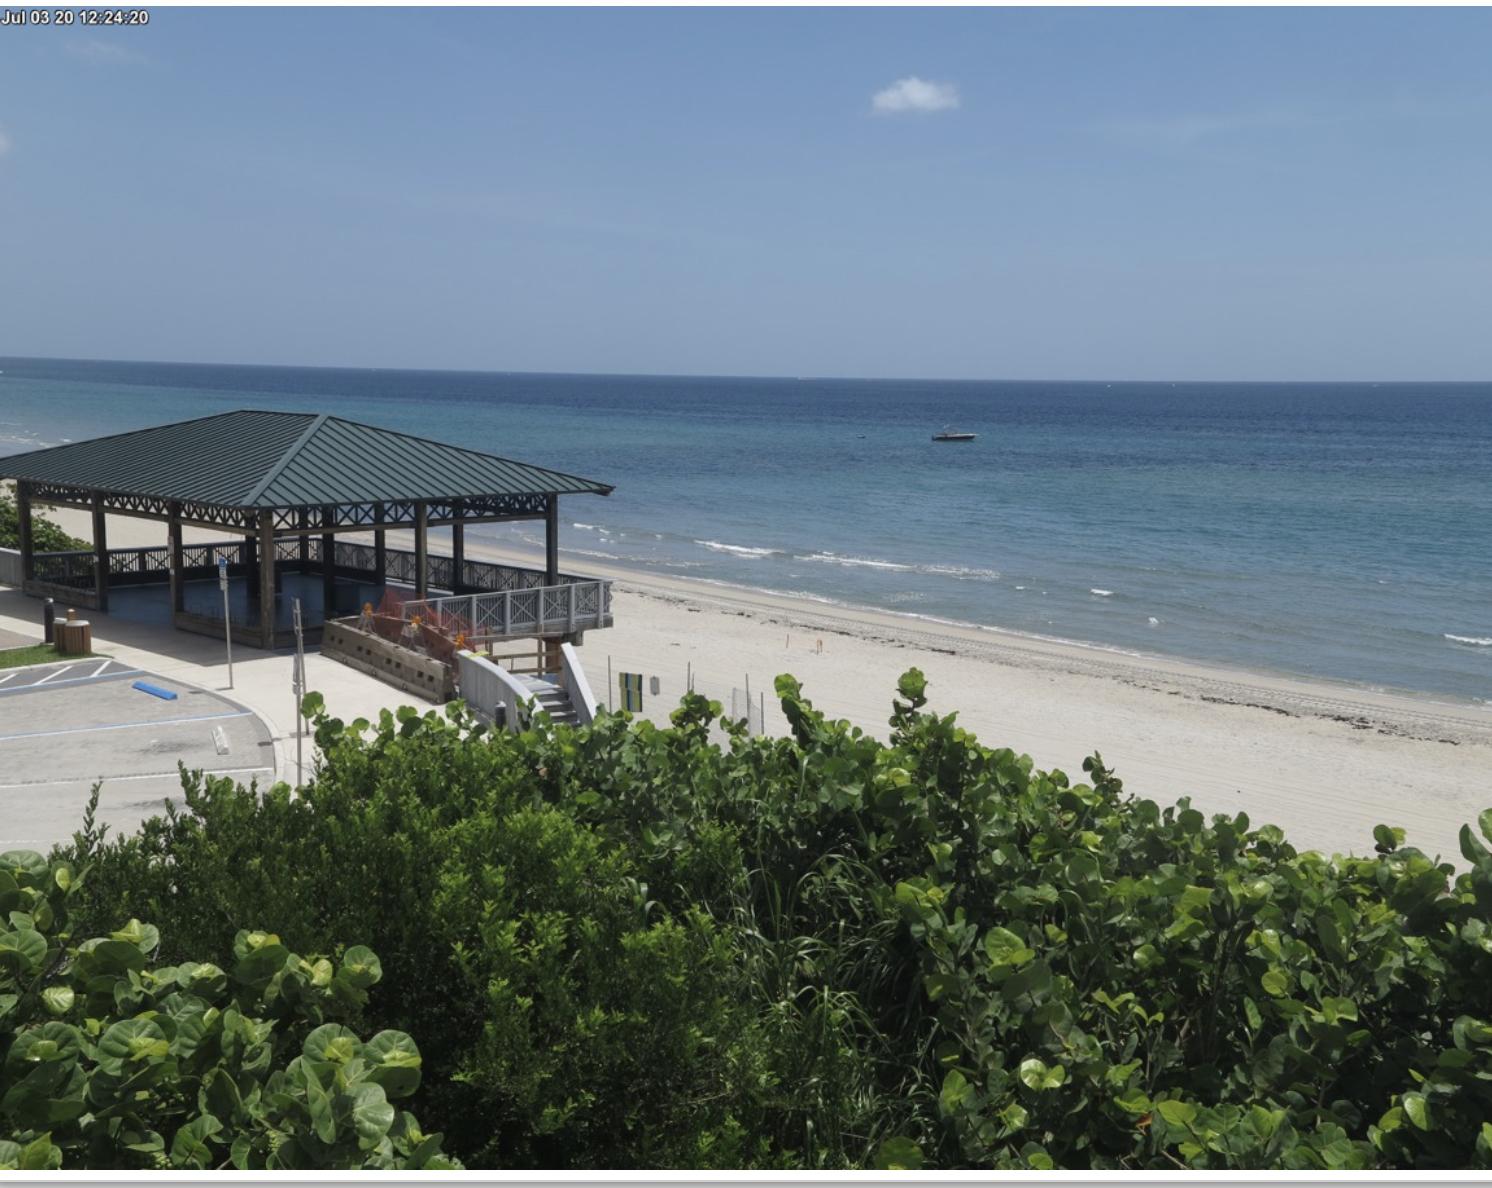 boca raton beach closed july 29